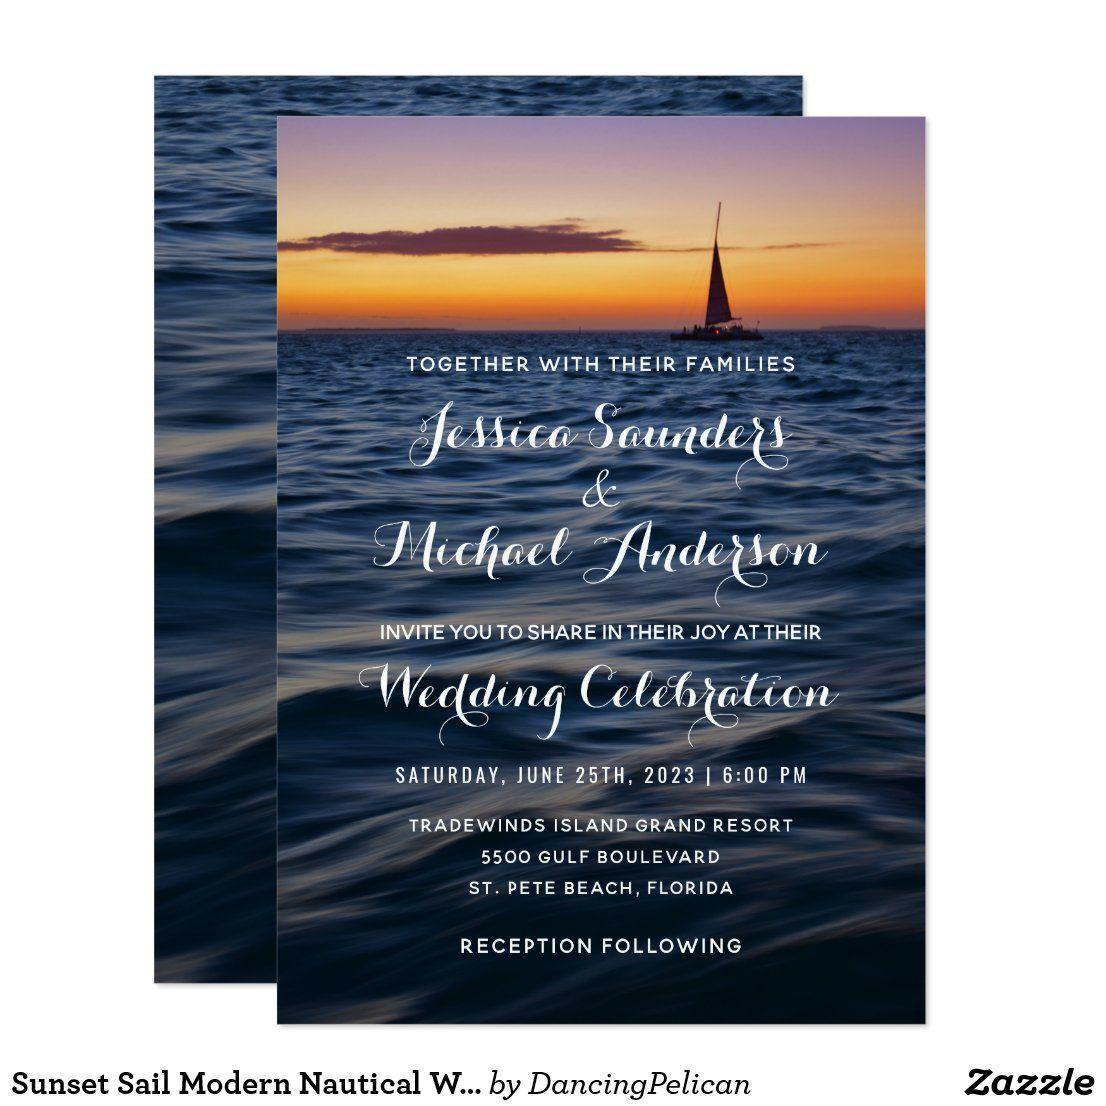 Sunset Sail Modern Nautical Wedding Invitation Zazzle